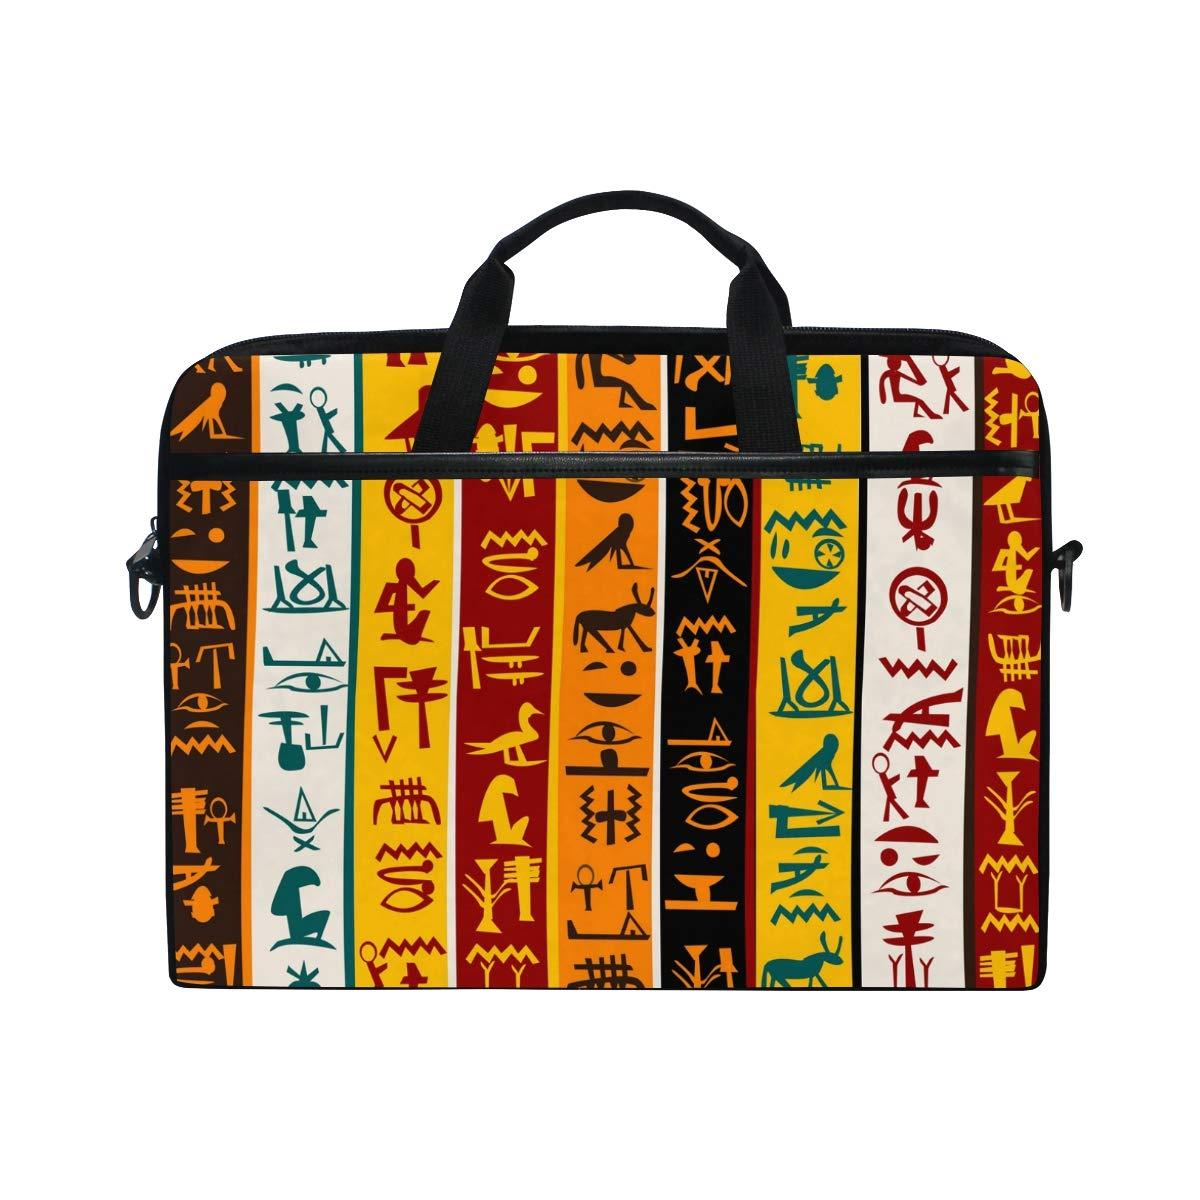 Ahomy Colorido Egipcio Hieroglyphs 14 – 15,4 Tela Pulgadas Multifuncional Tela 15,4 Impermeable portátil Bolsa maletín Bandolera Bandolera cac9c9